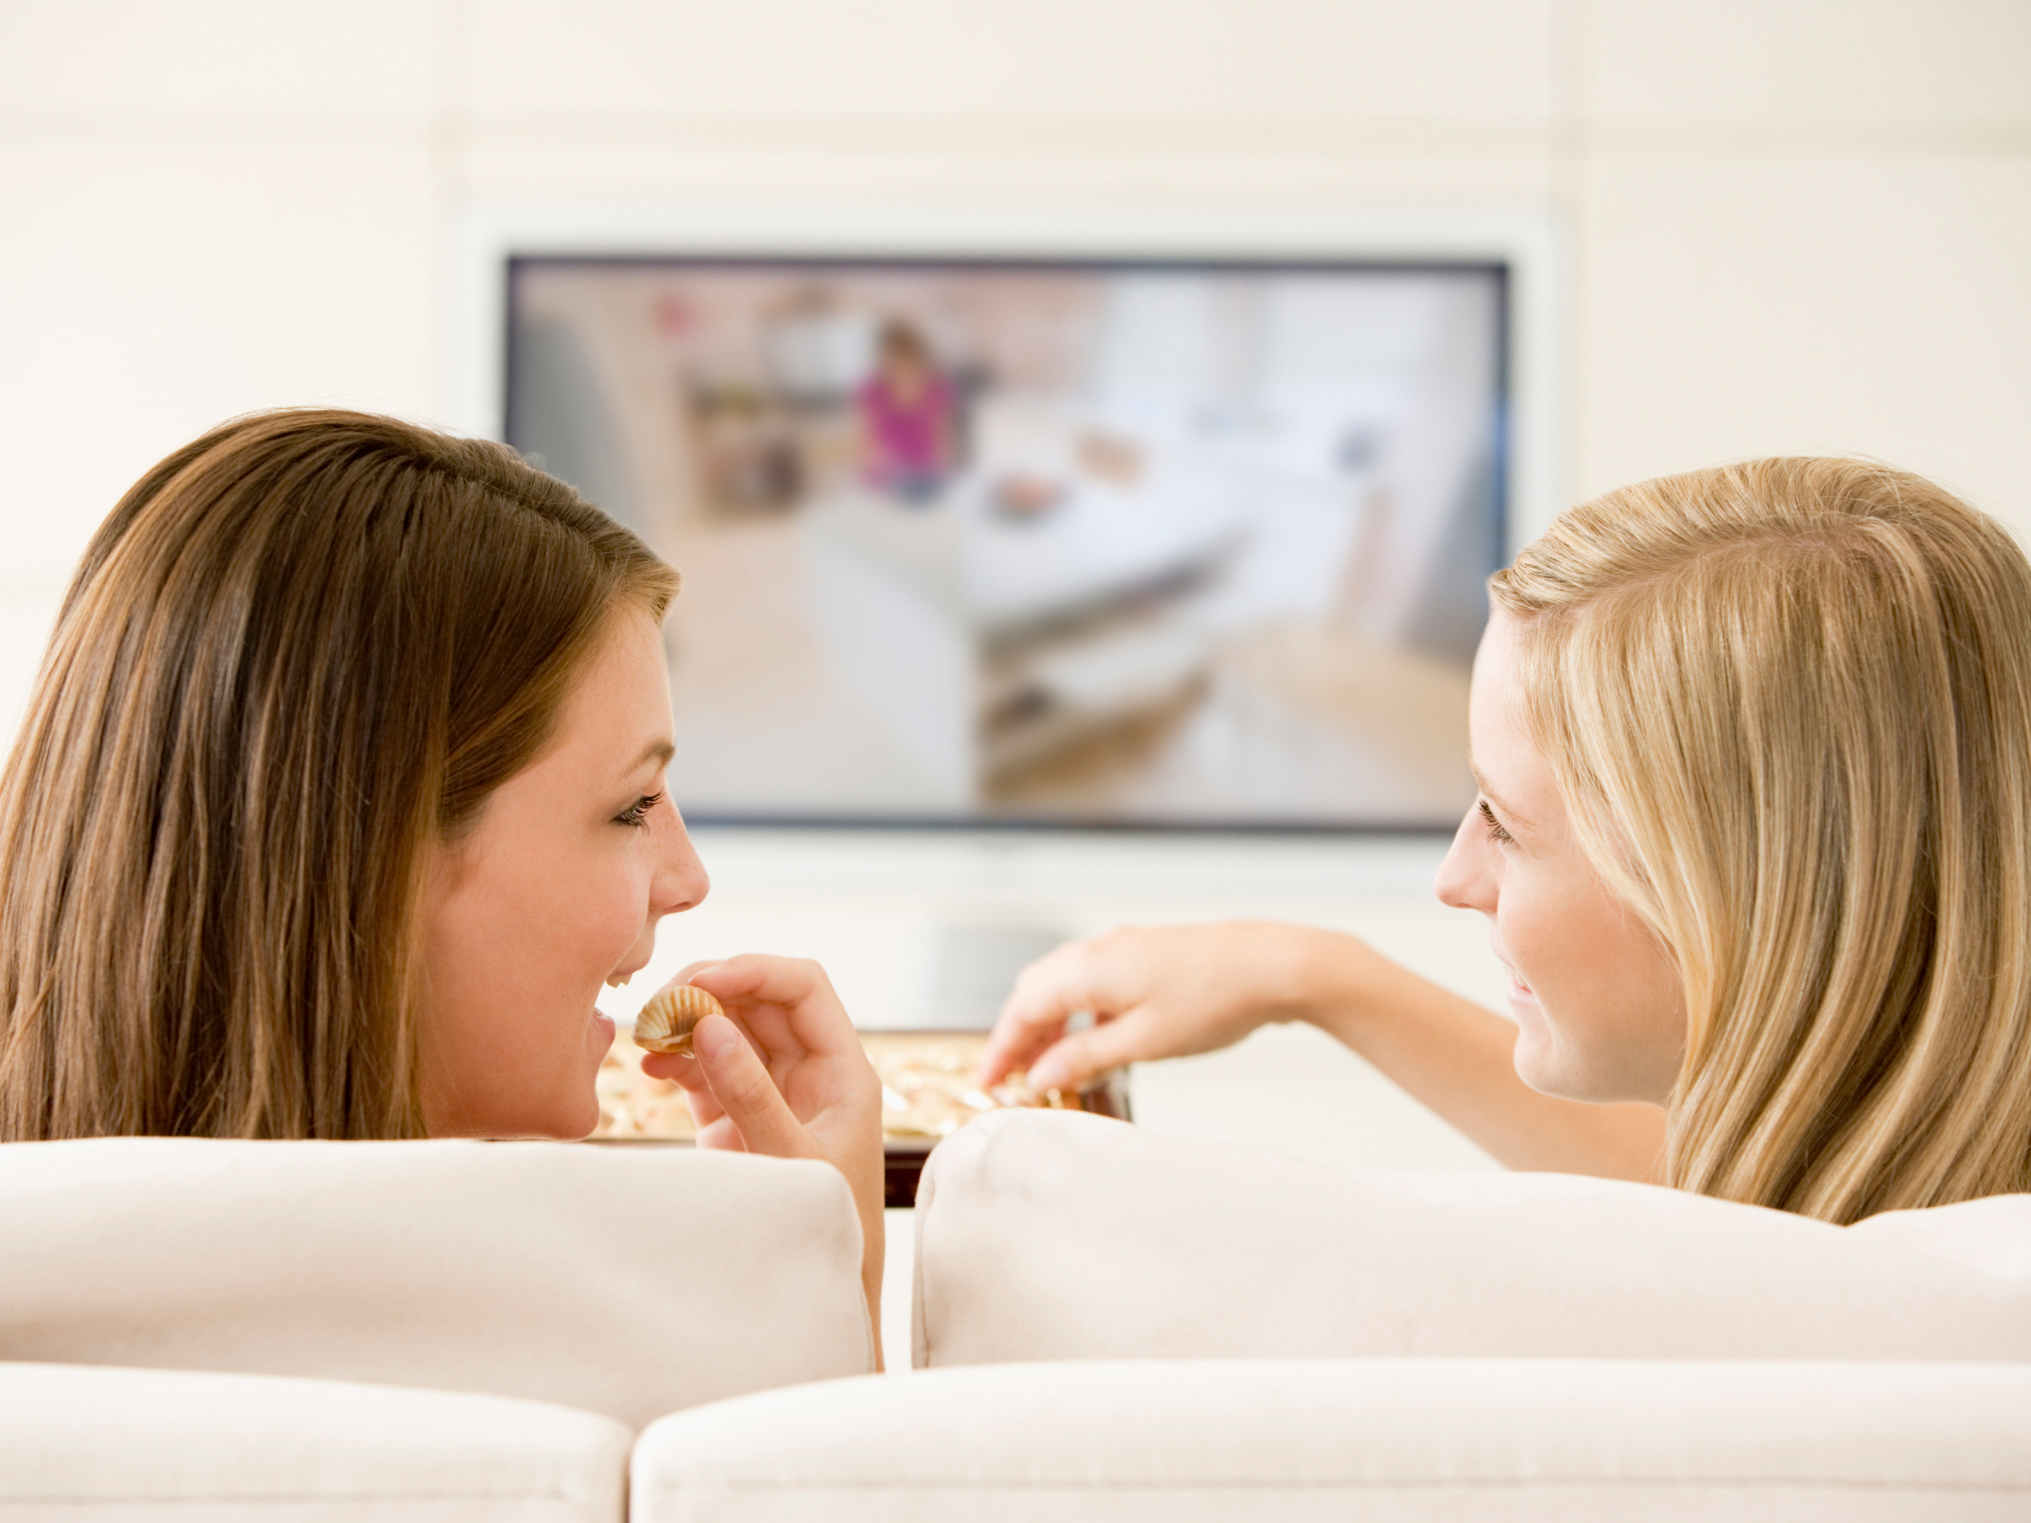 Ladies watching TV